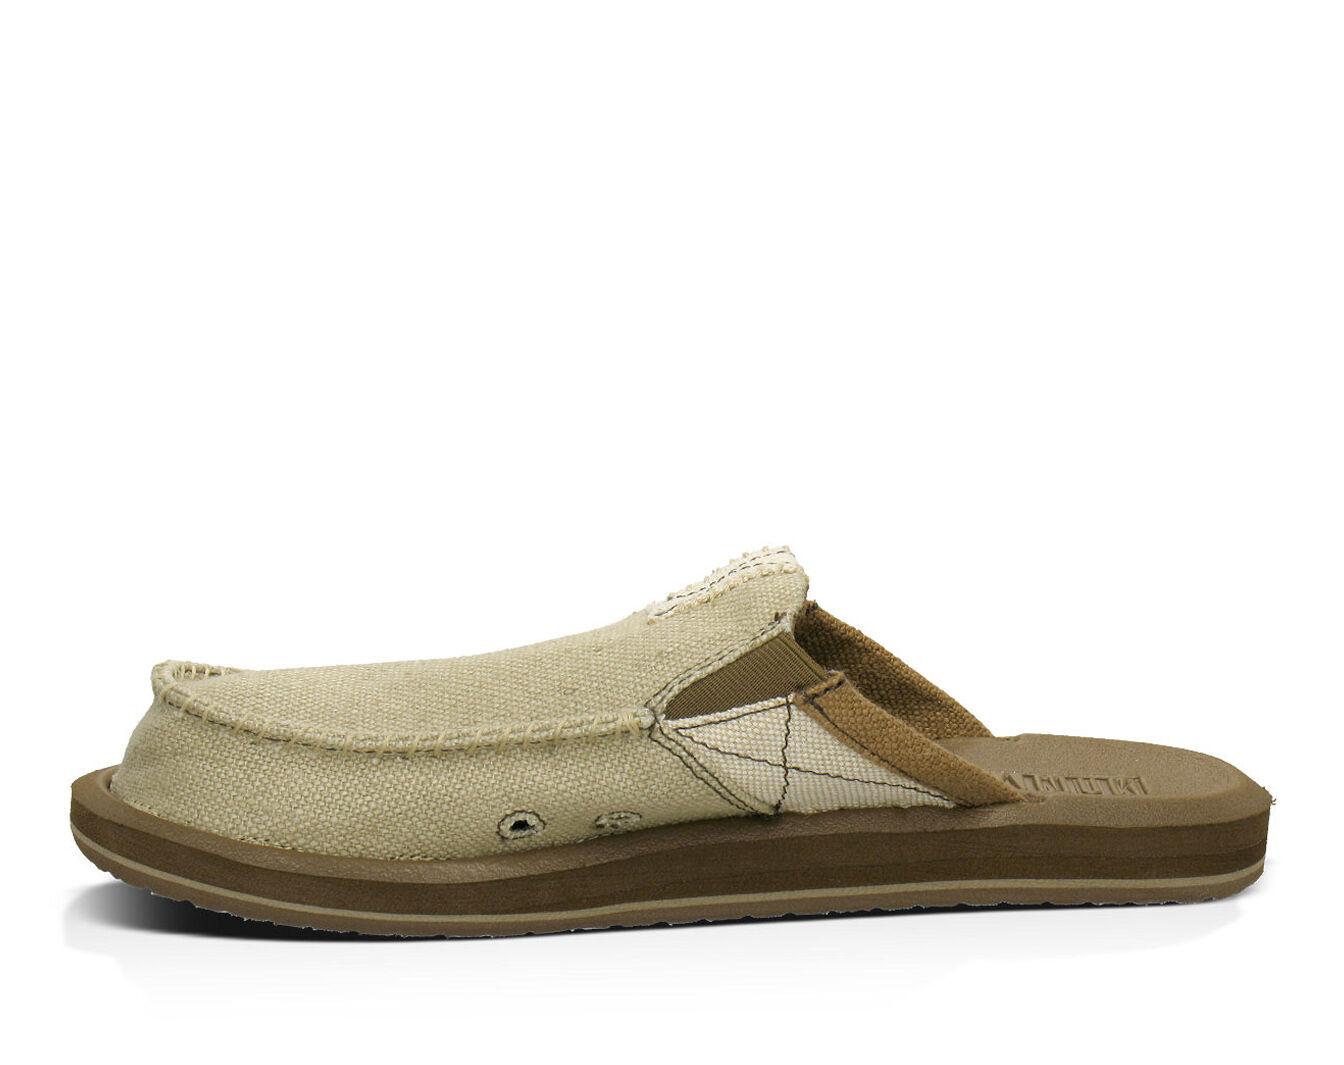 US, M Sanuk Mens You Got My Back II Sandals Tan 13 D